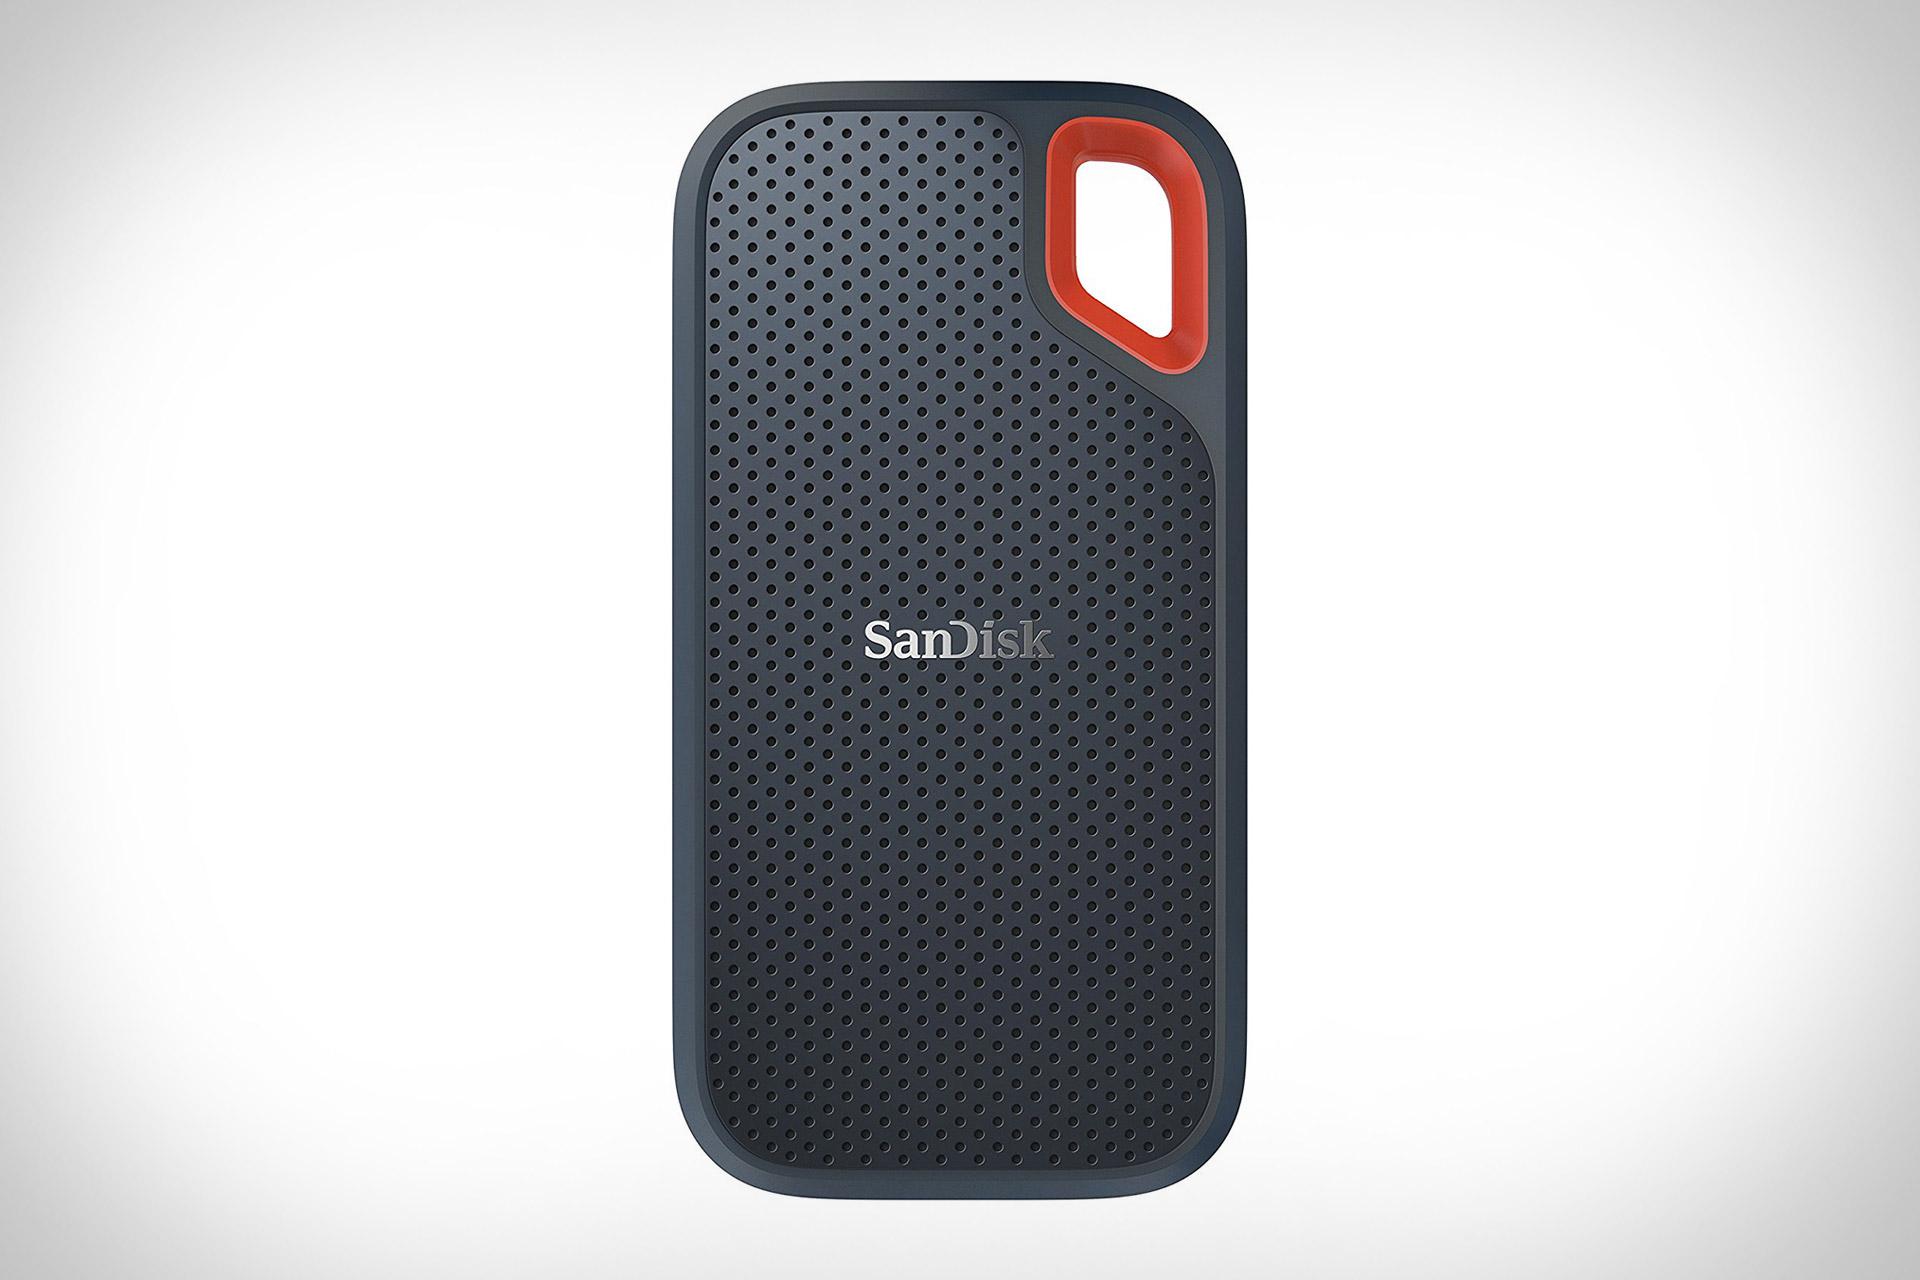 SanDisk Extreme Portable SSD